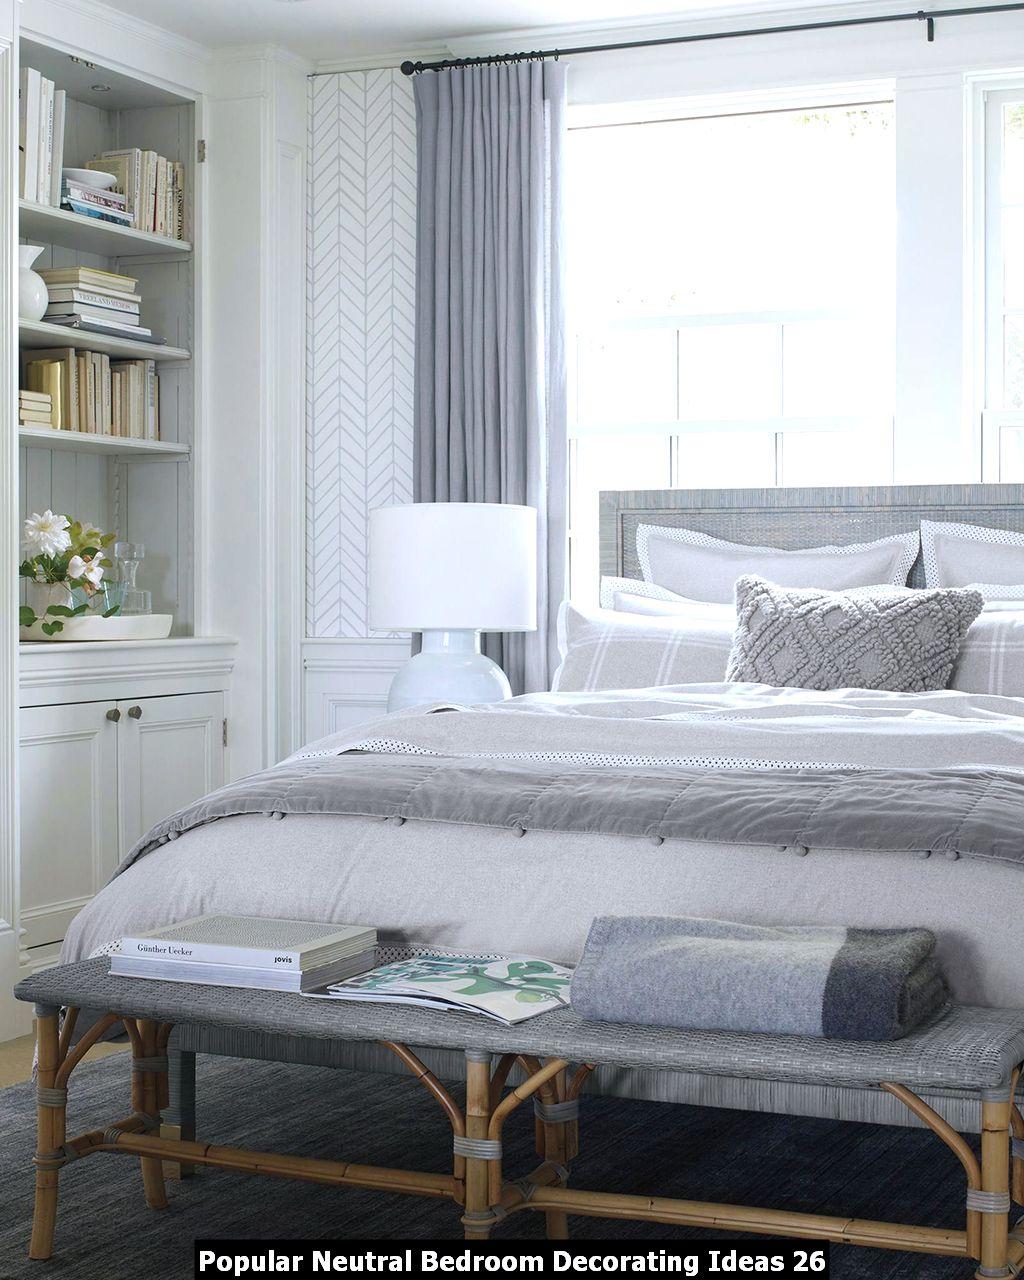 Popular Neutral Bedroom Decorating Ideas 26